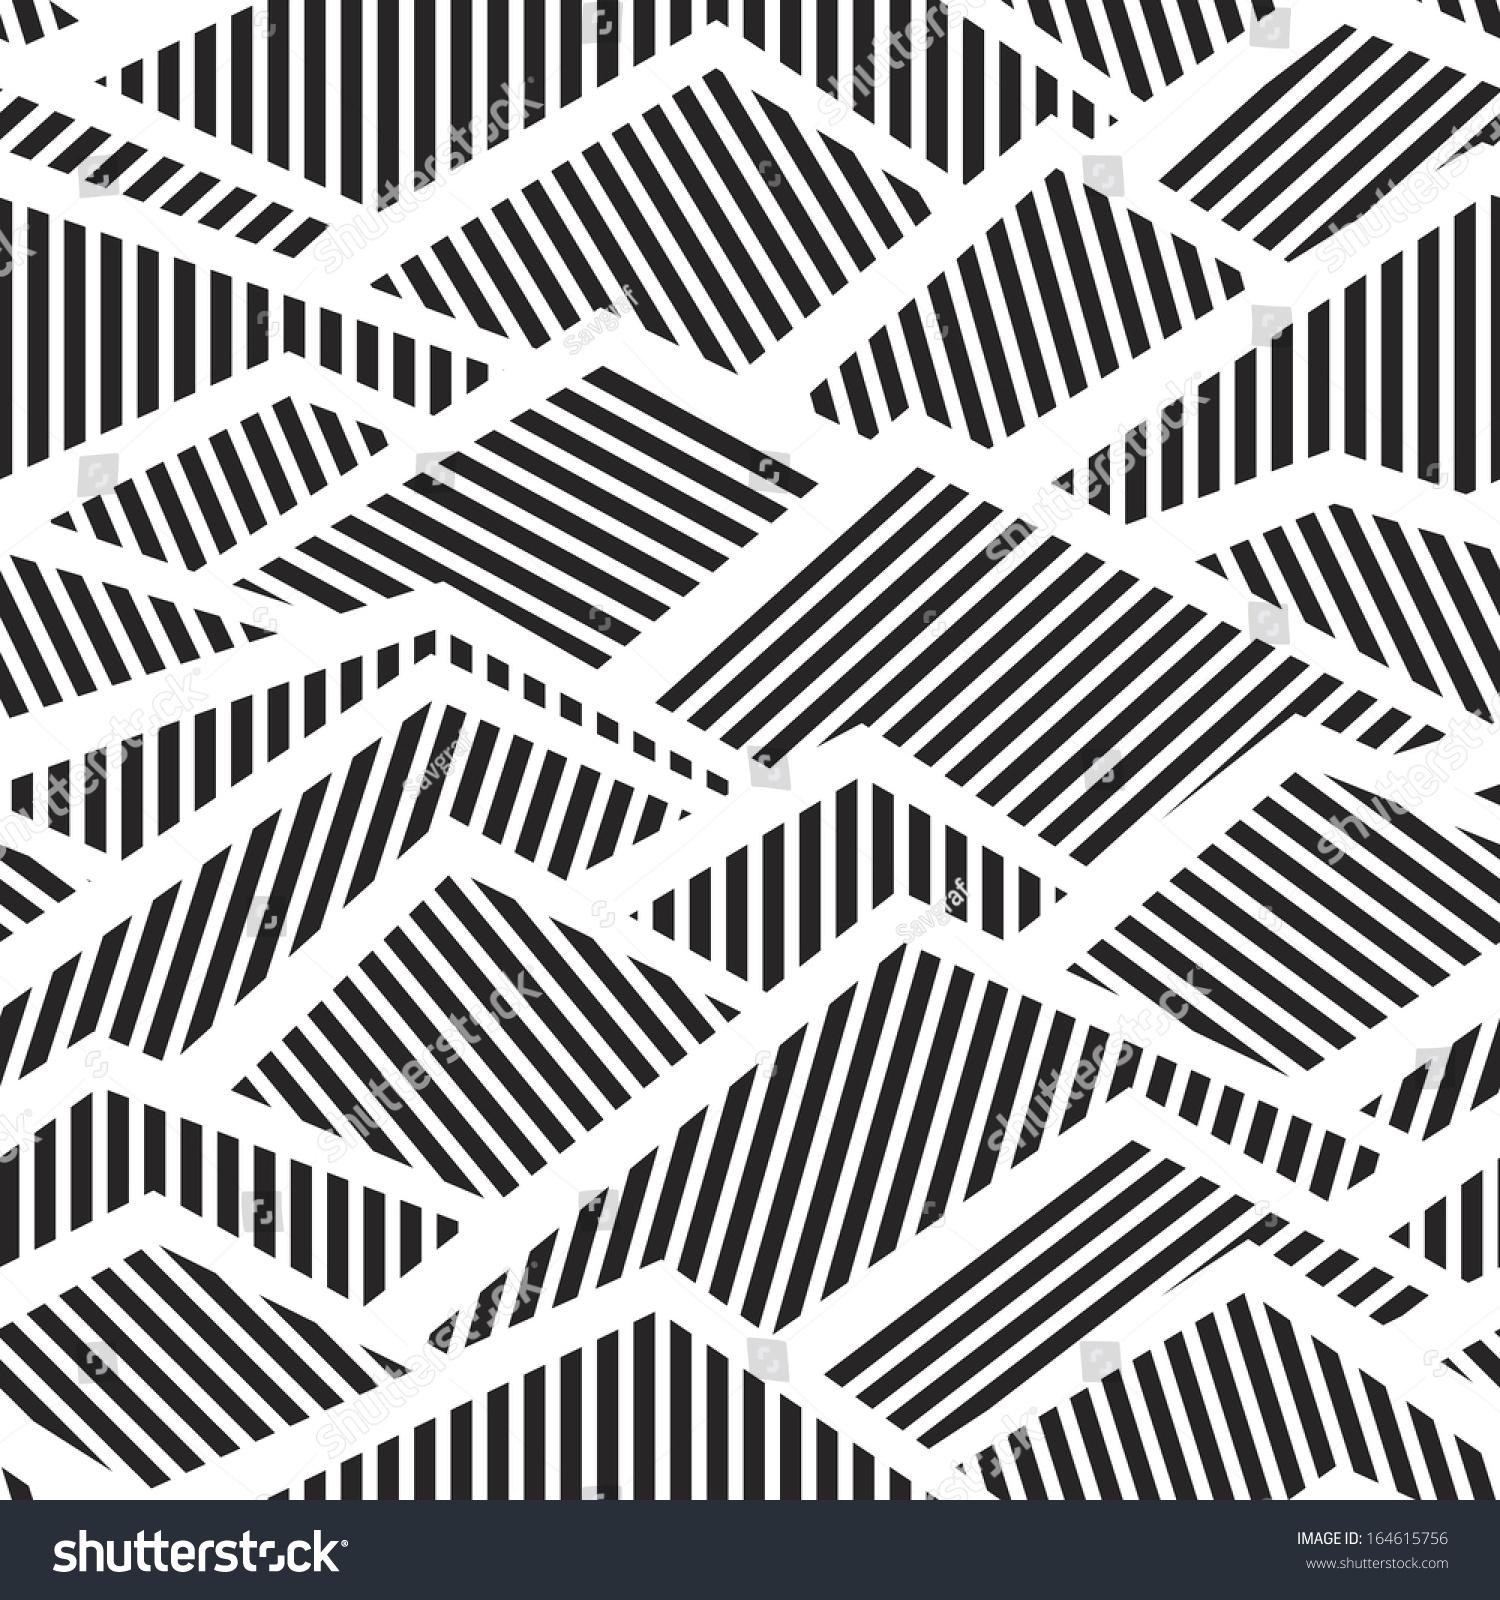 Ftphouseofauracom Vector Abstract Seamless Pattern